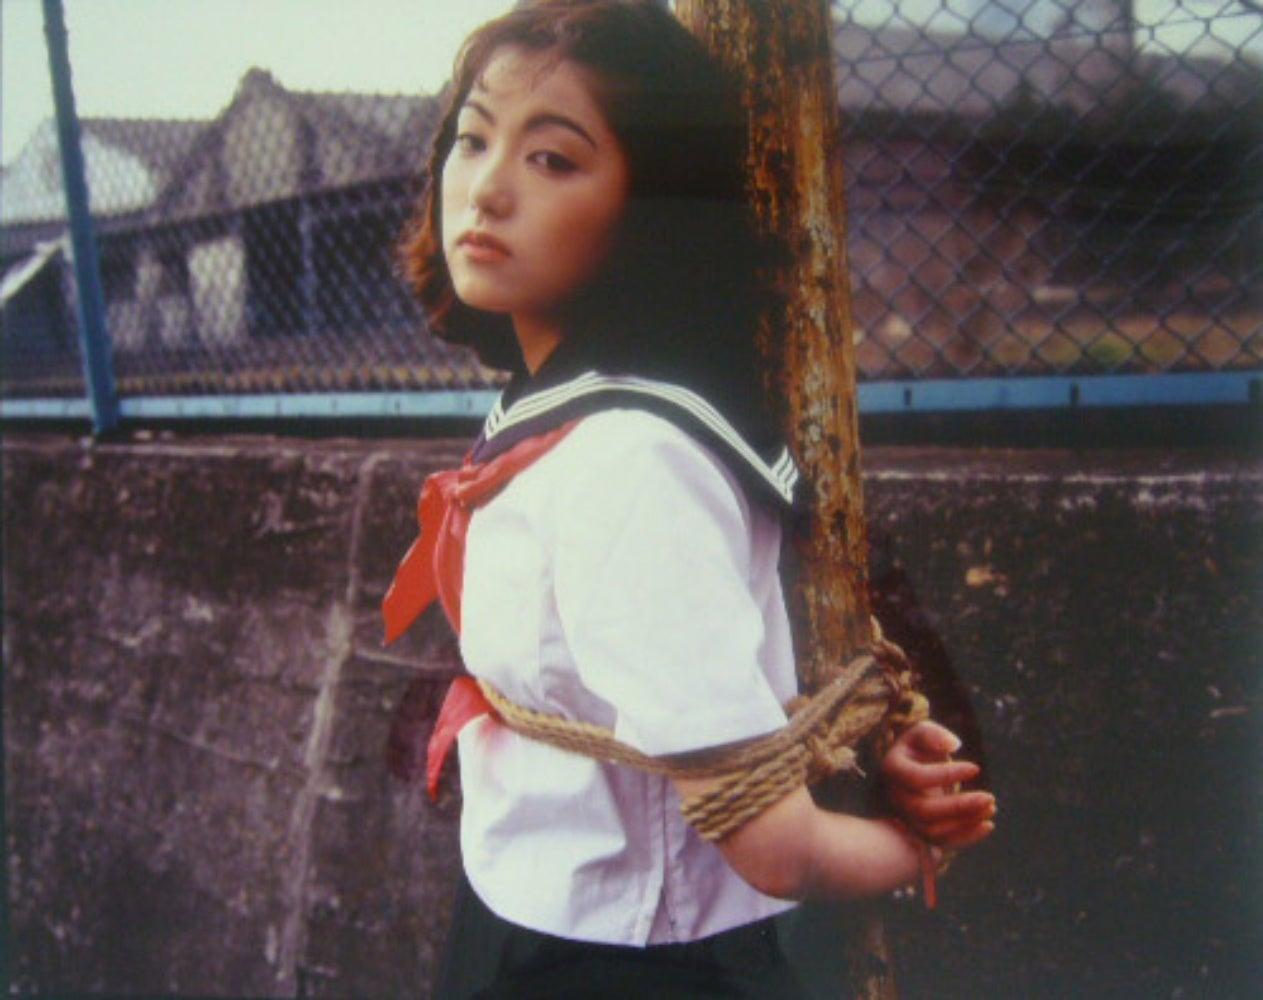 67 Shooting Back #non3 – Nobuyoshi Araki, Woman, Bondage, Japan, Photography